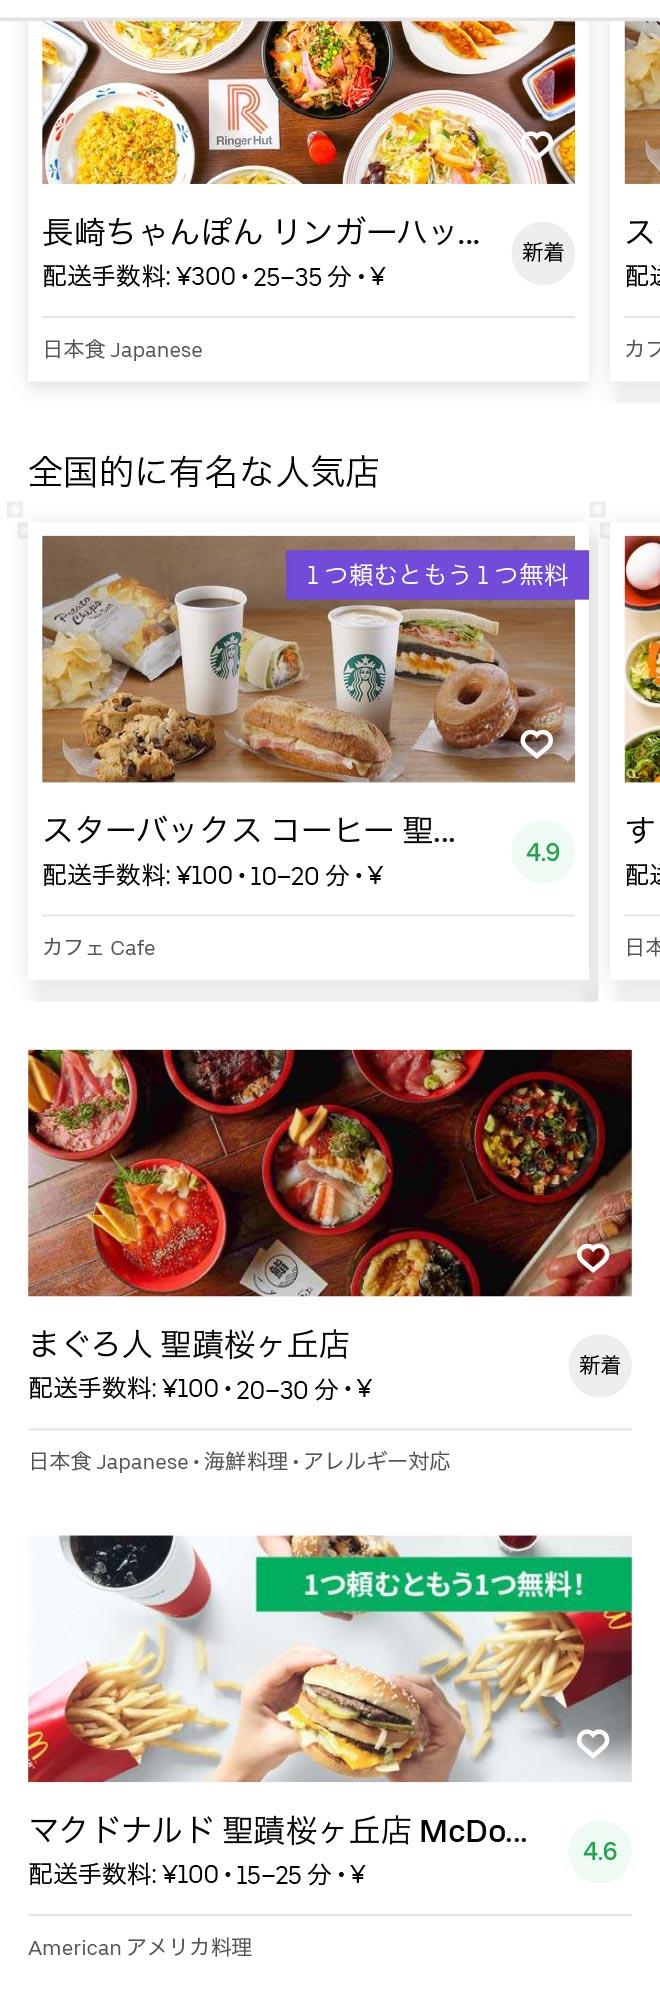 Seiseki menu 2007 01